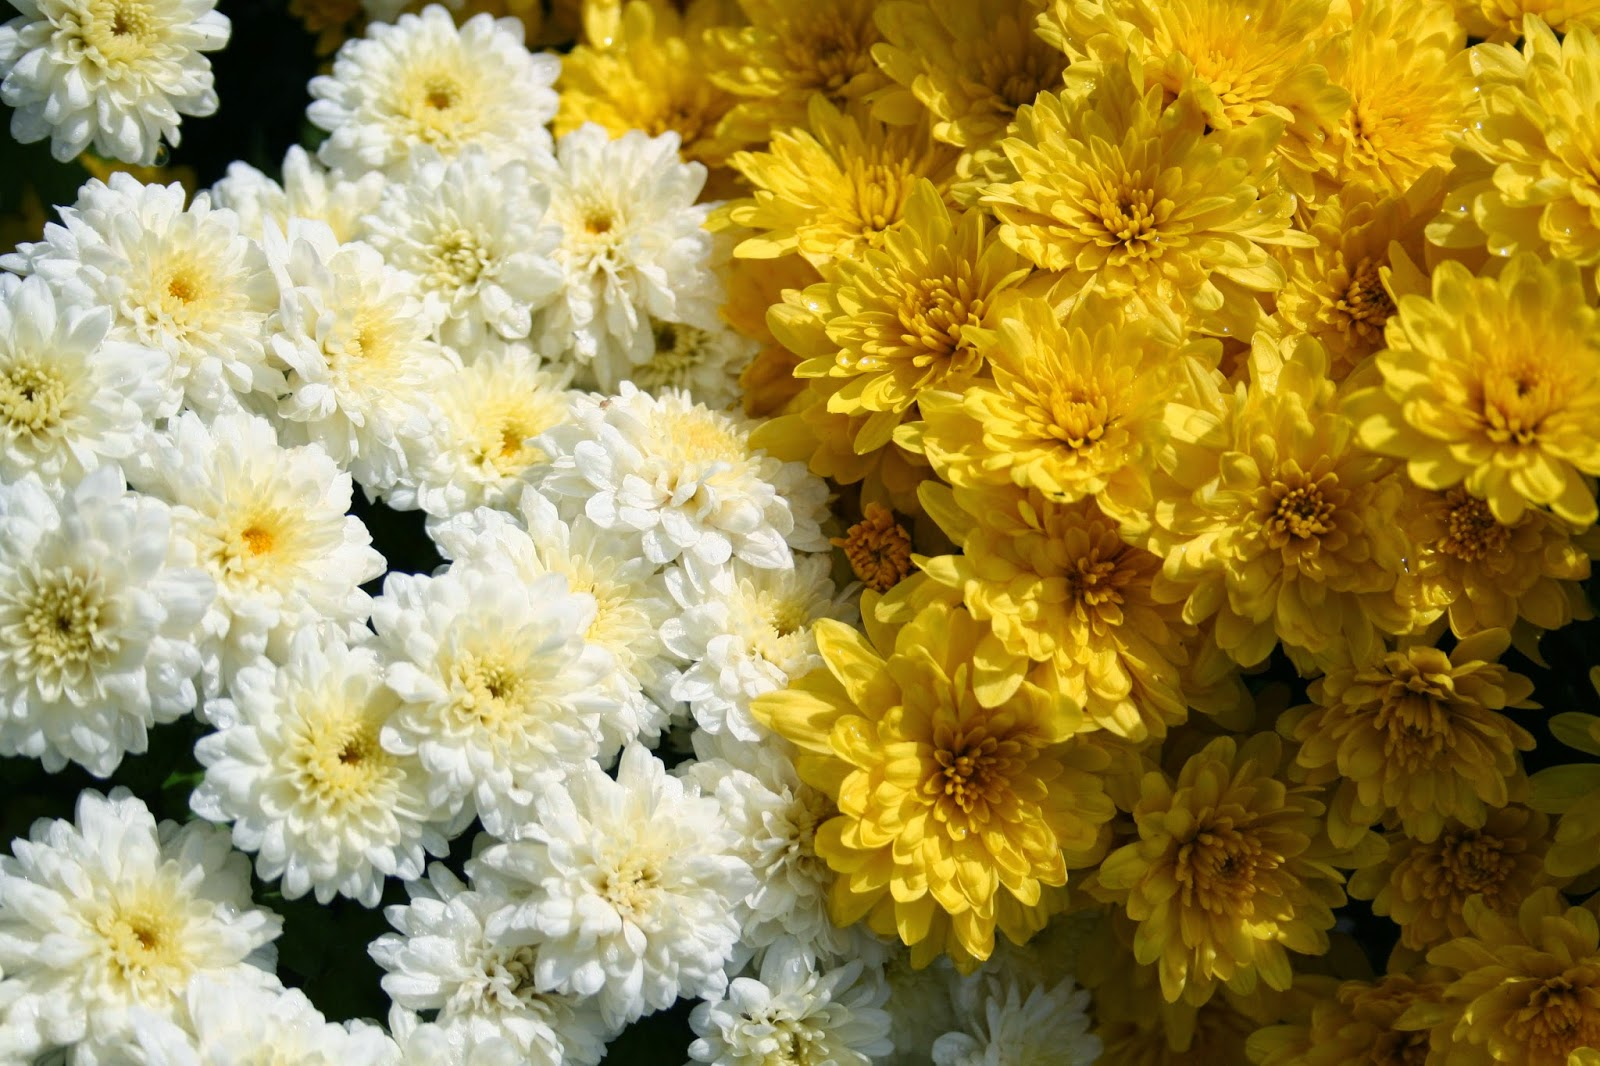 White Chrysanthemum Flower Meaning